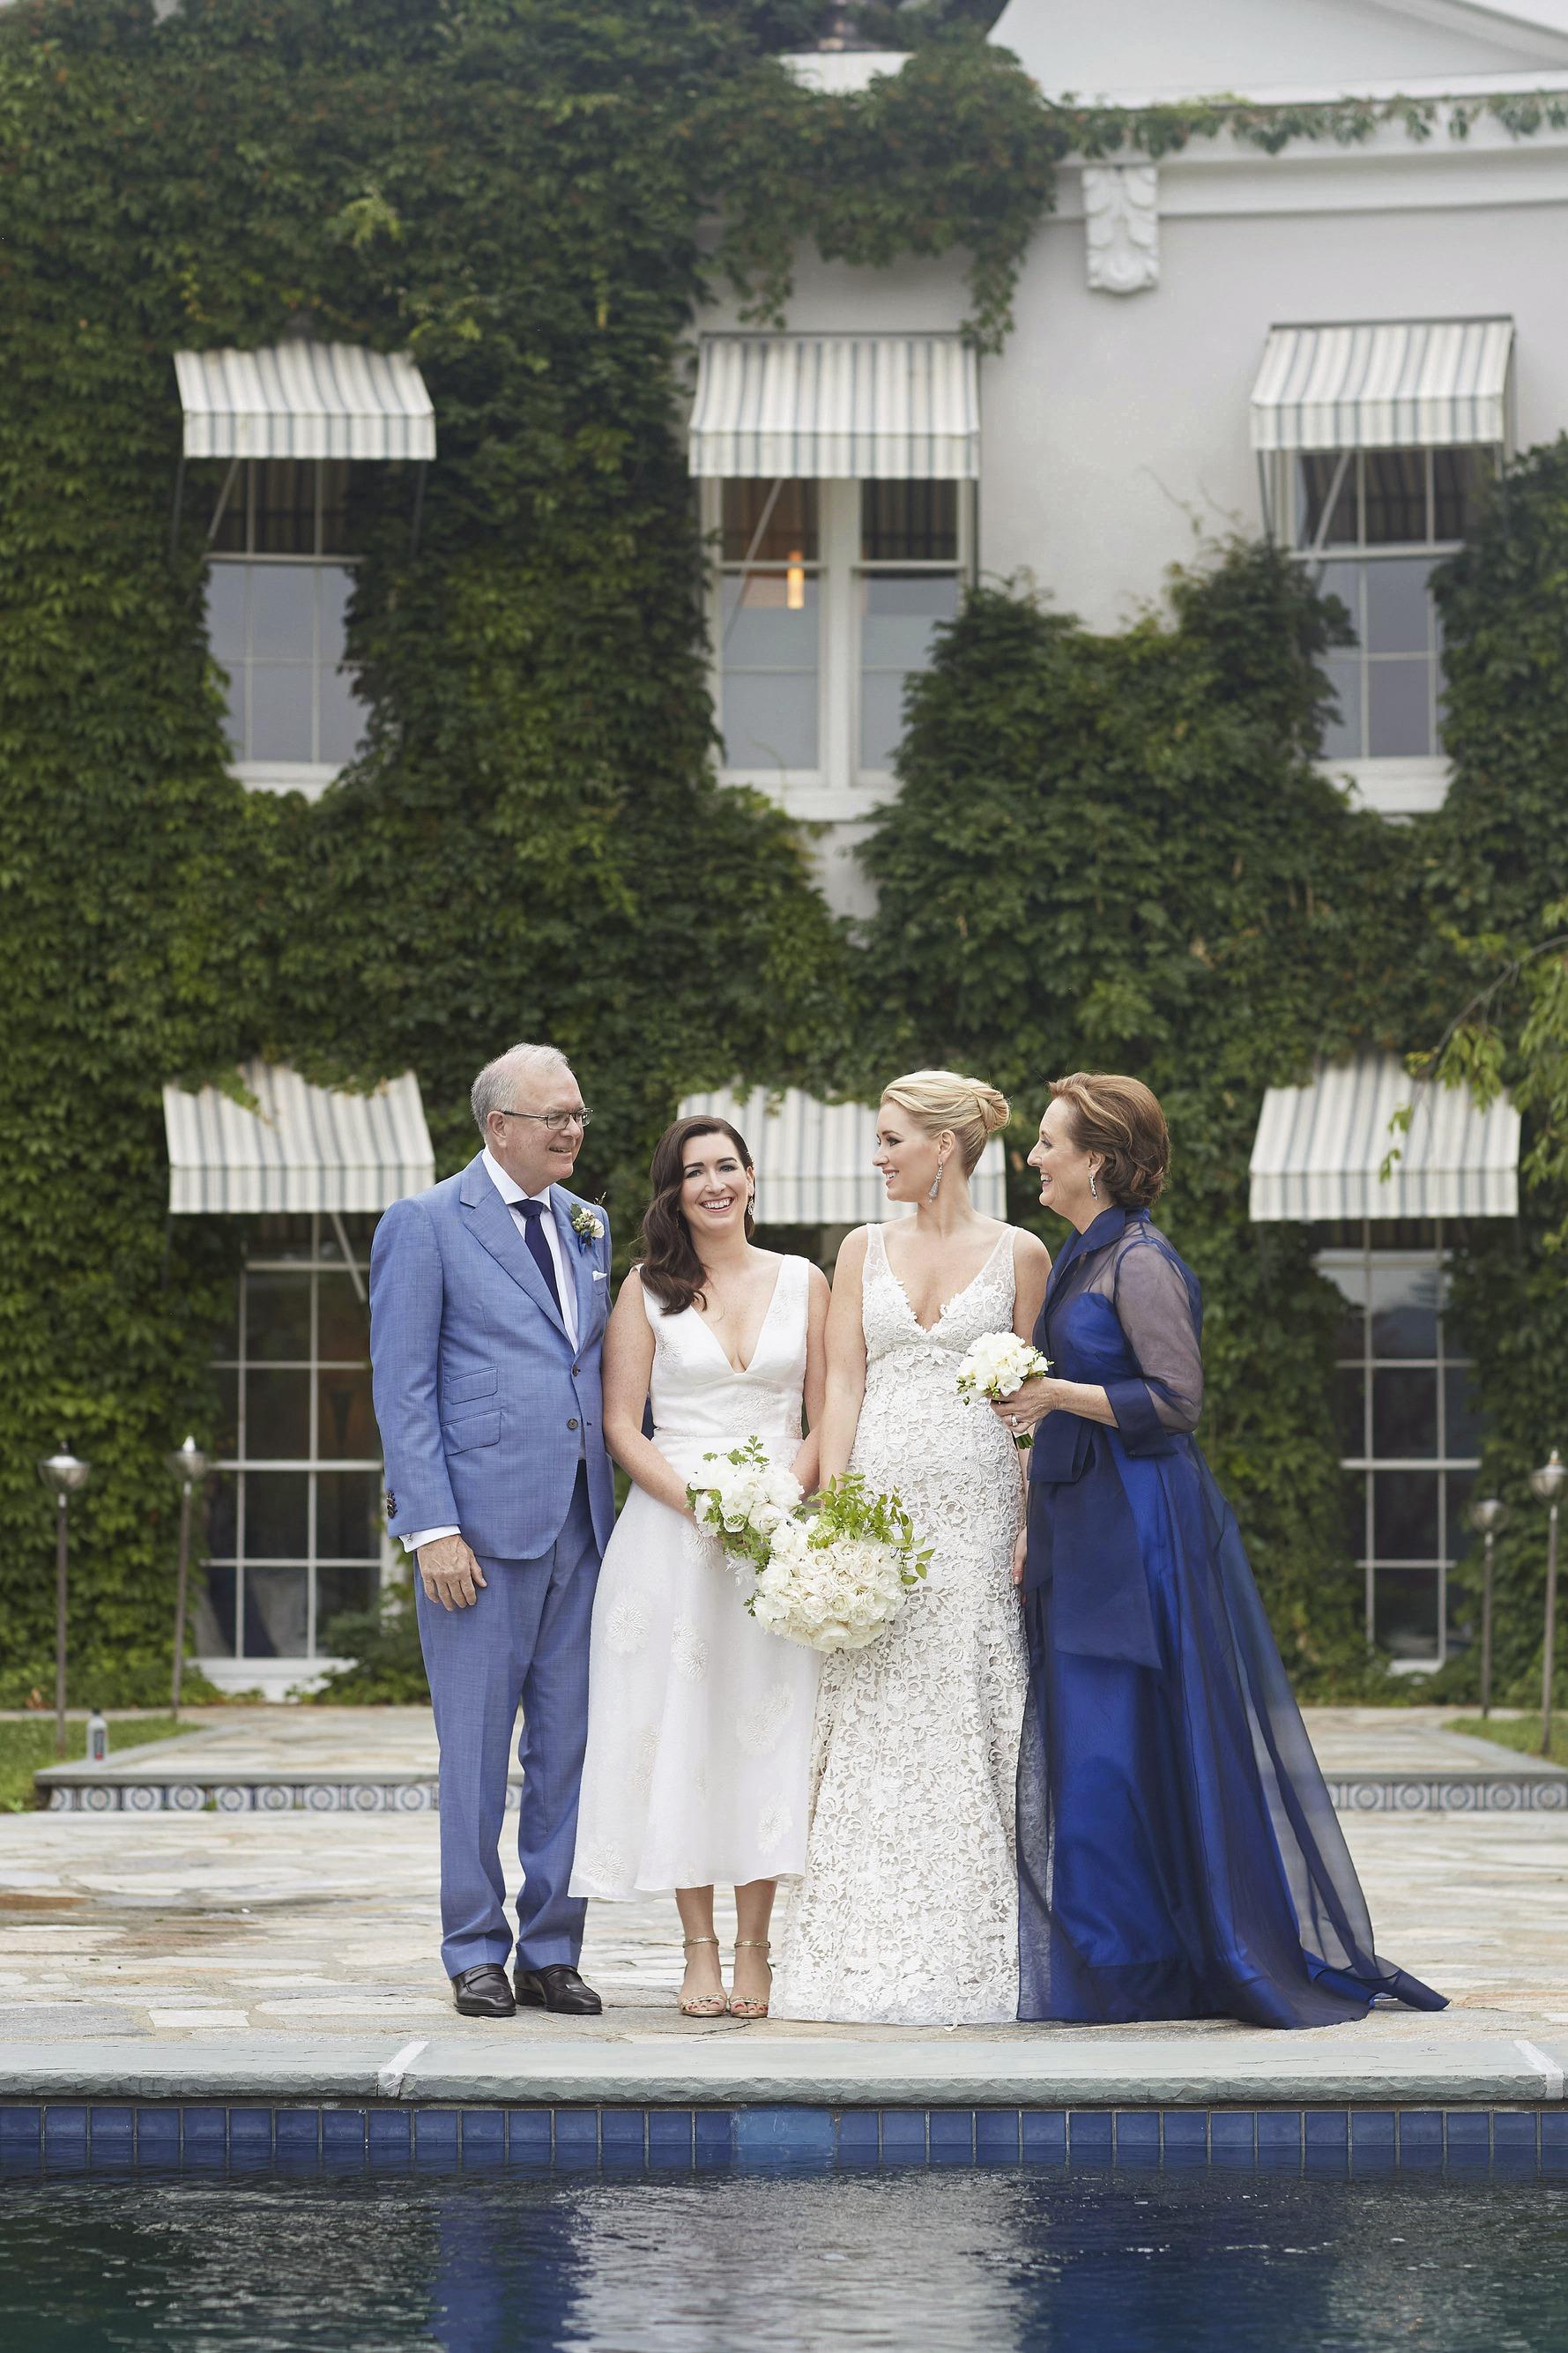 joyann jeremy wedding bride's family